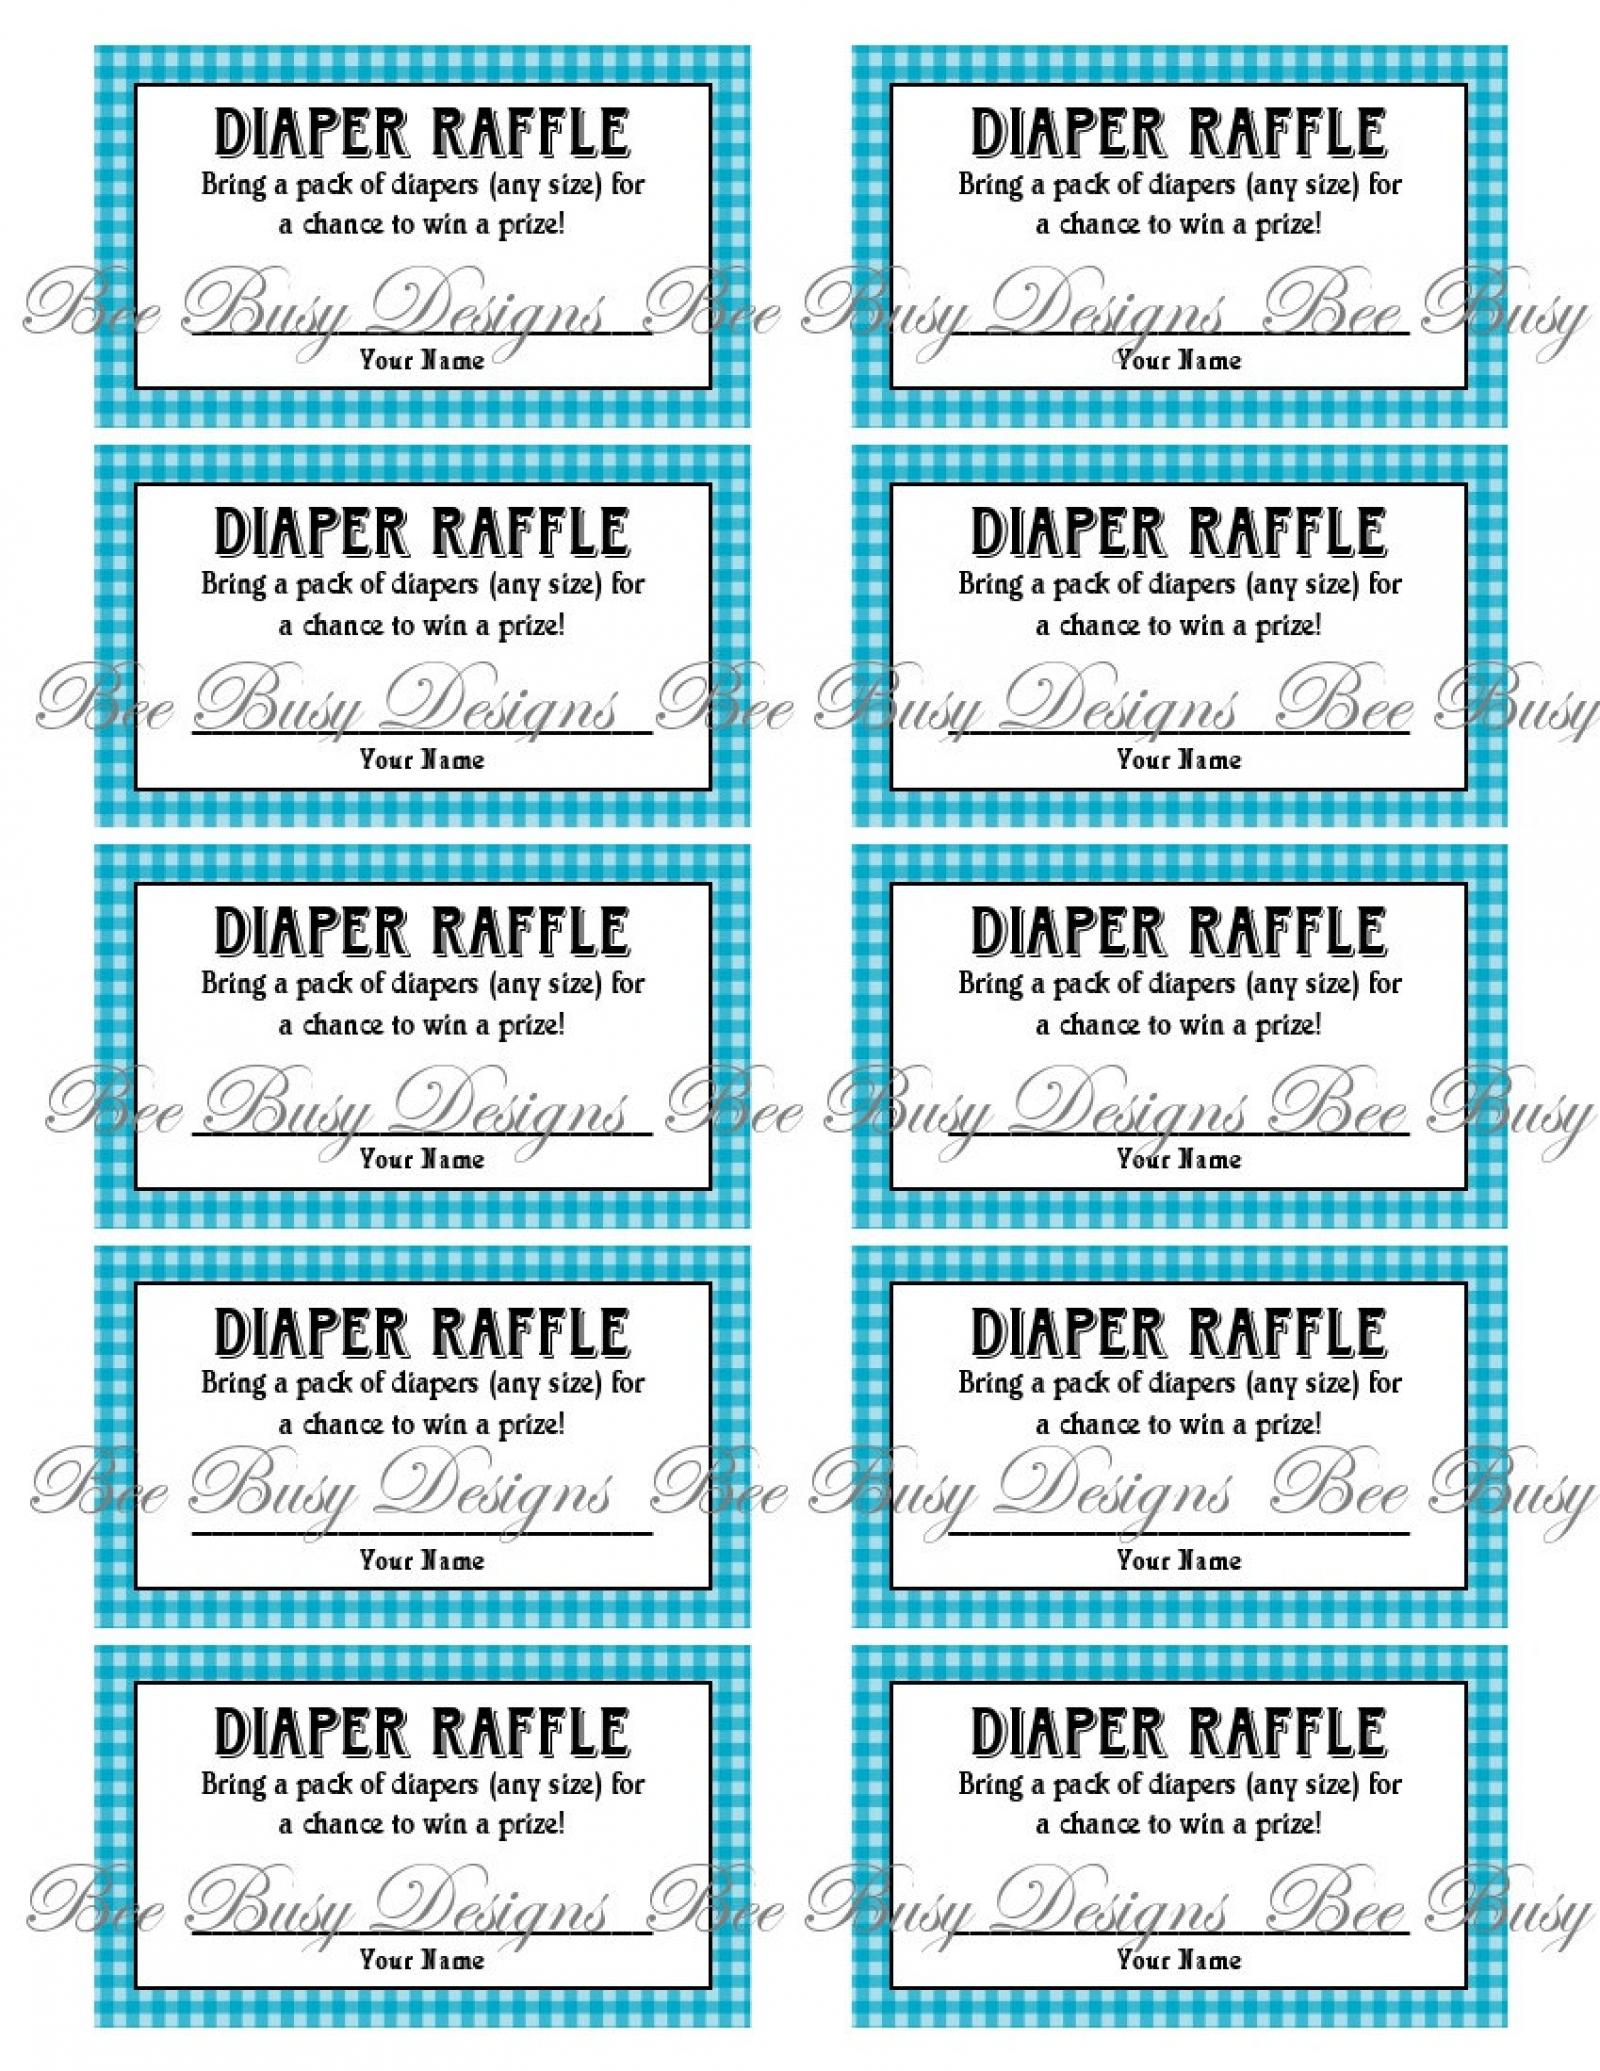 006 Template Ideas P Diaper Raffle ~ Ulyssesroom - Diaper Raffle Template Free Printable